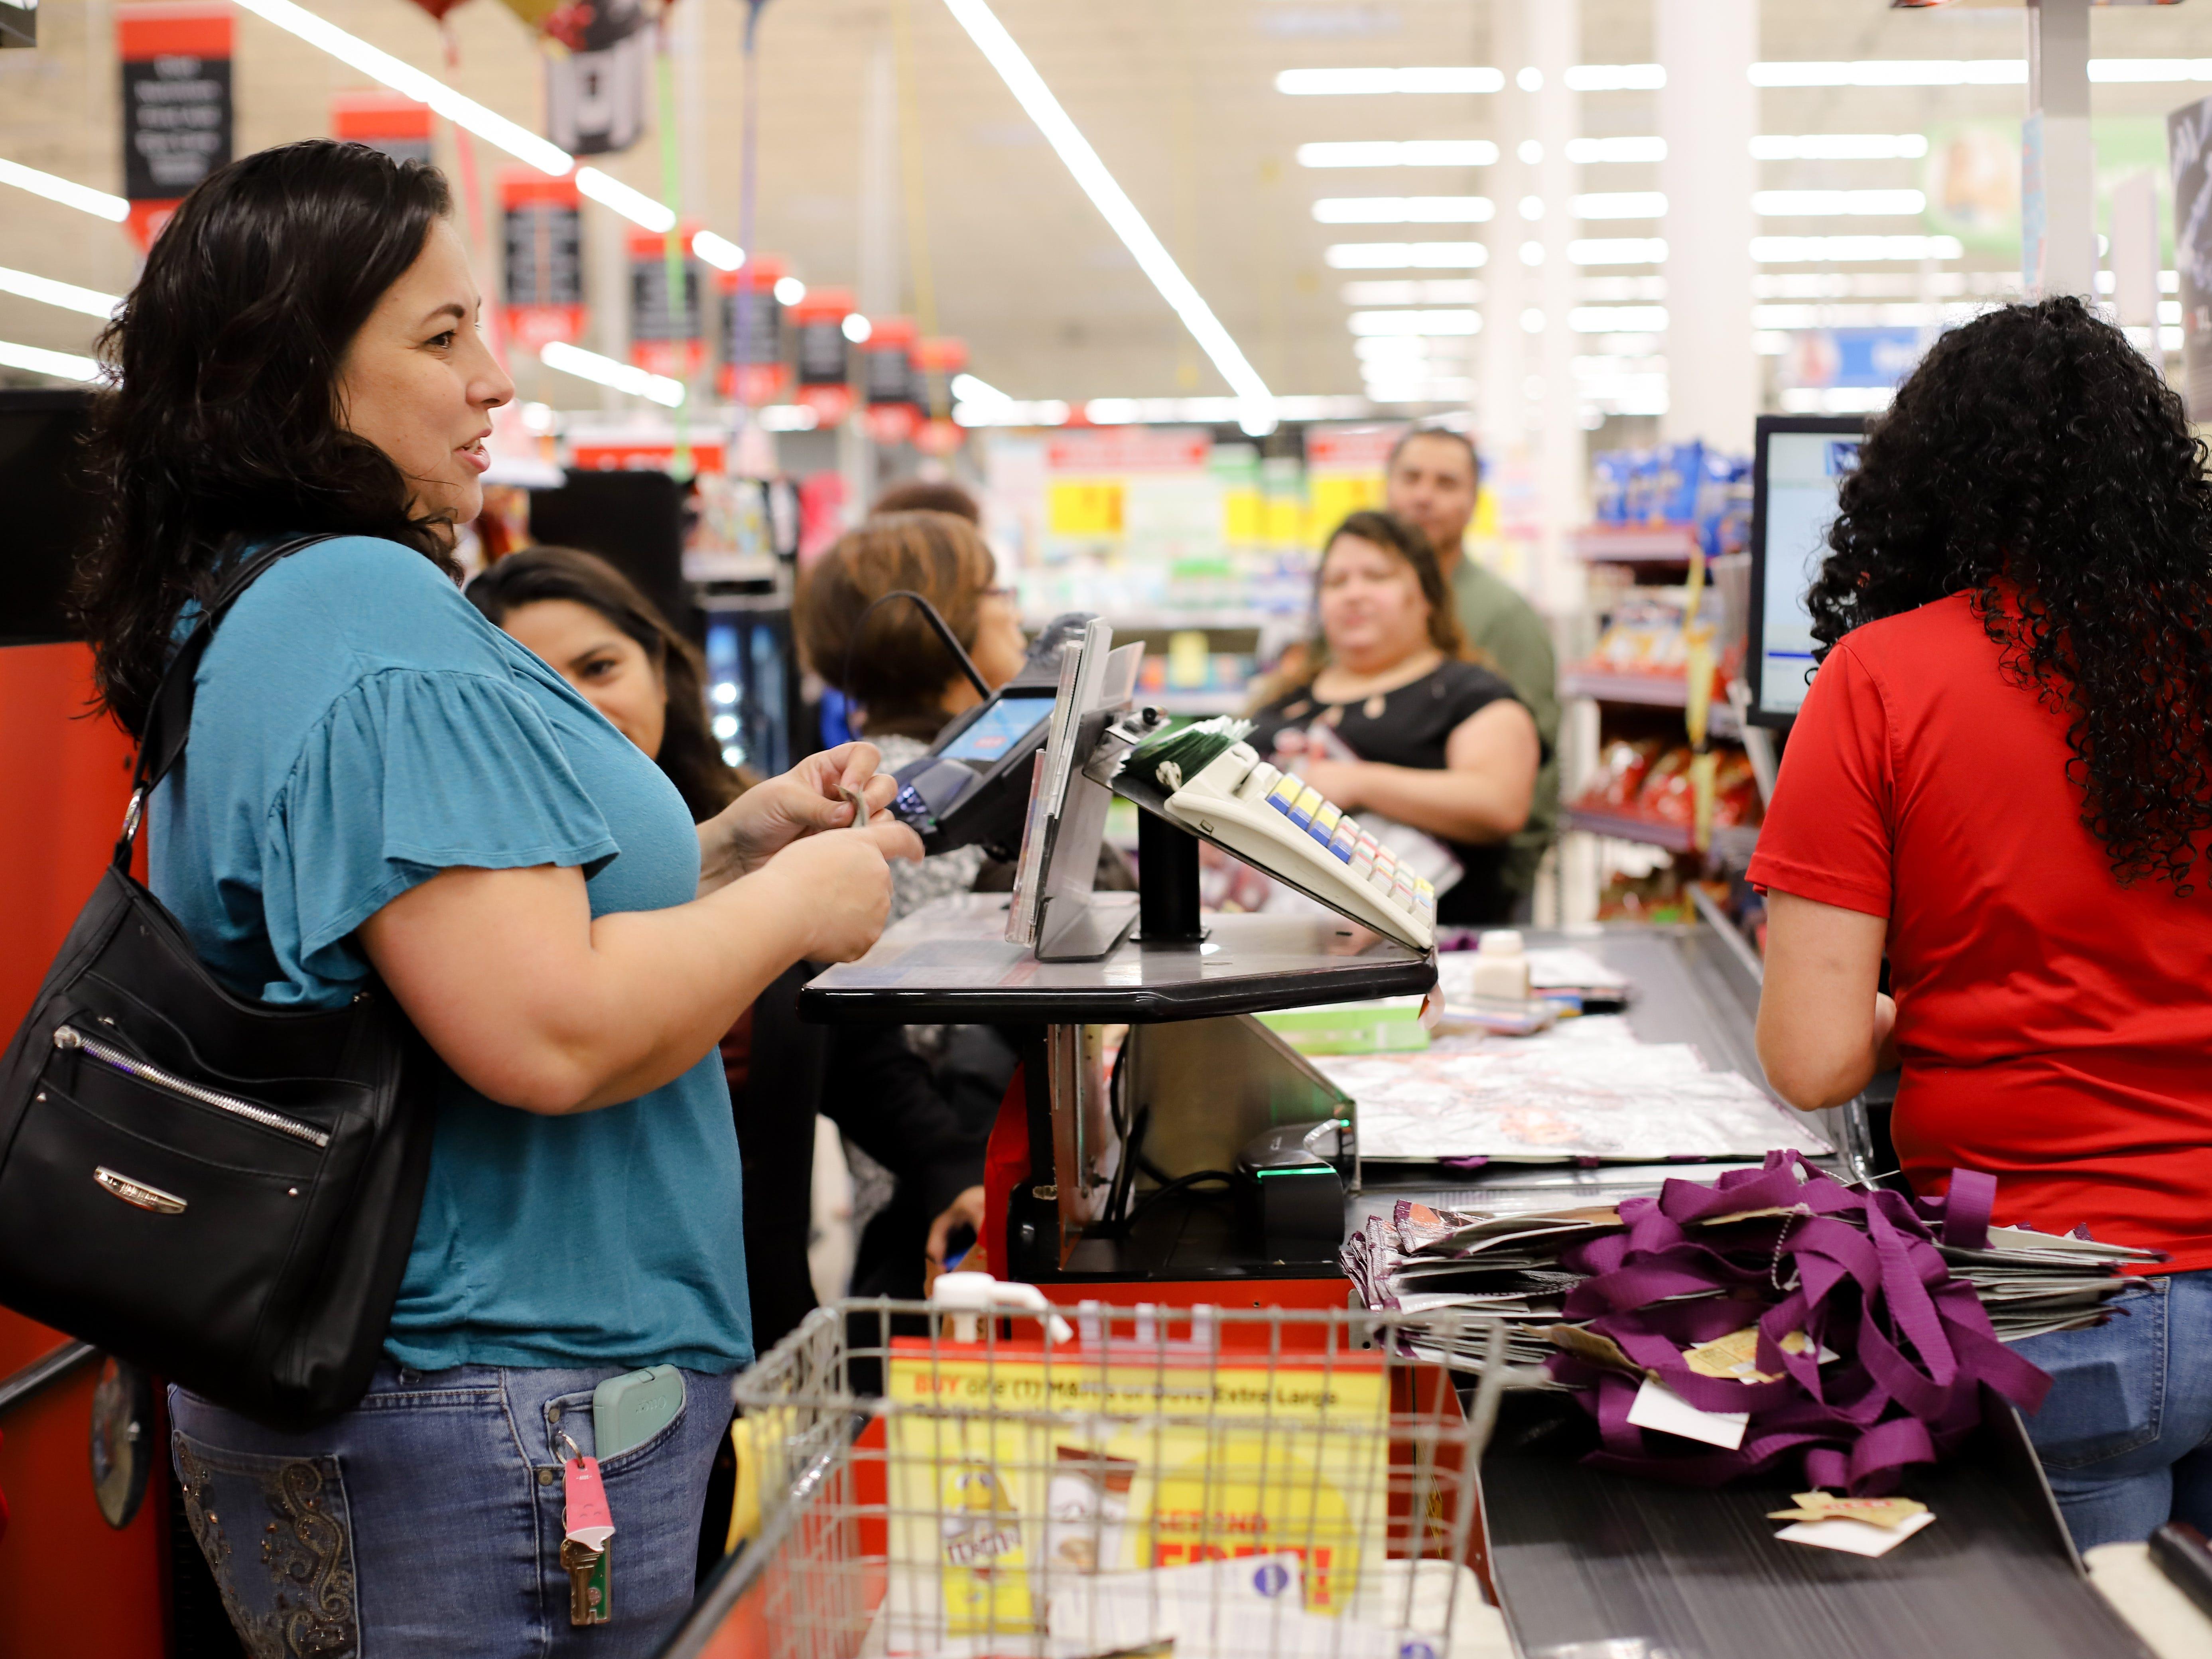 Corpus Christi Rita Thomas buys Selena reusable bags at the H-E-B Plus on Saratoga Boulevard in Corpus Christ on Dec. 6, 2018.